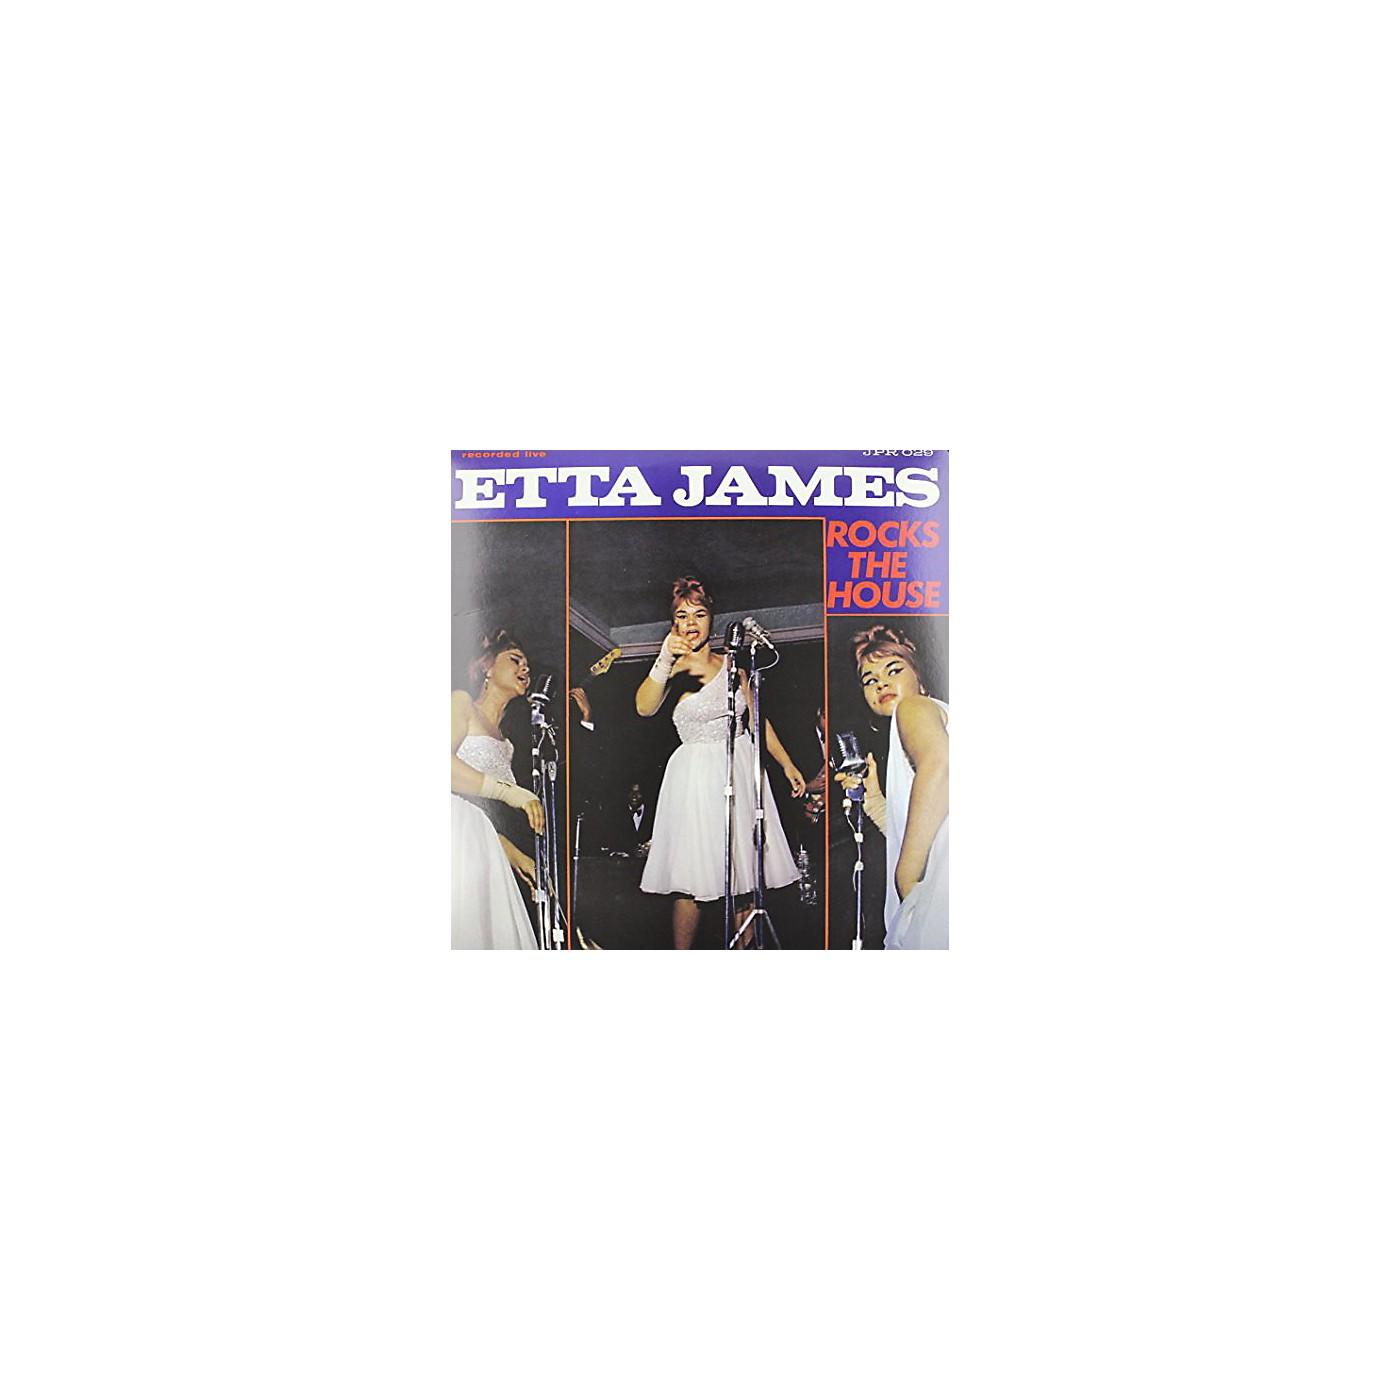 Alliance Etta James - Rocks the House thumbnail